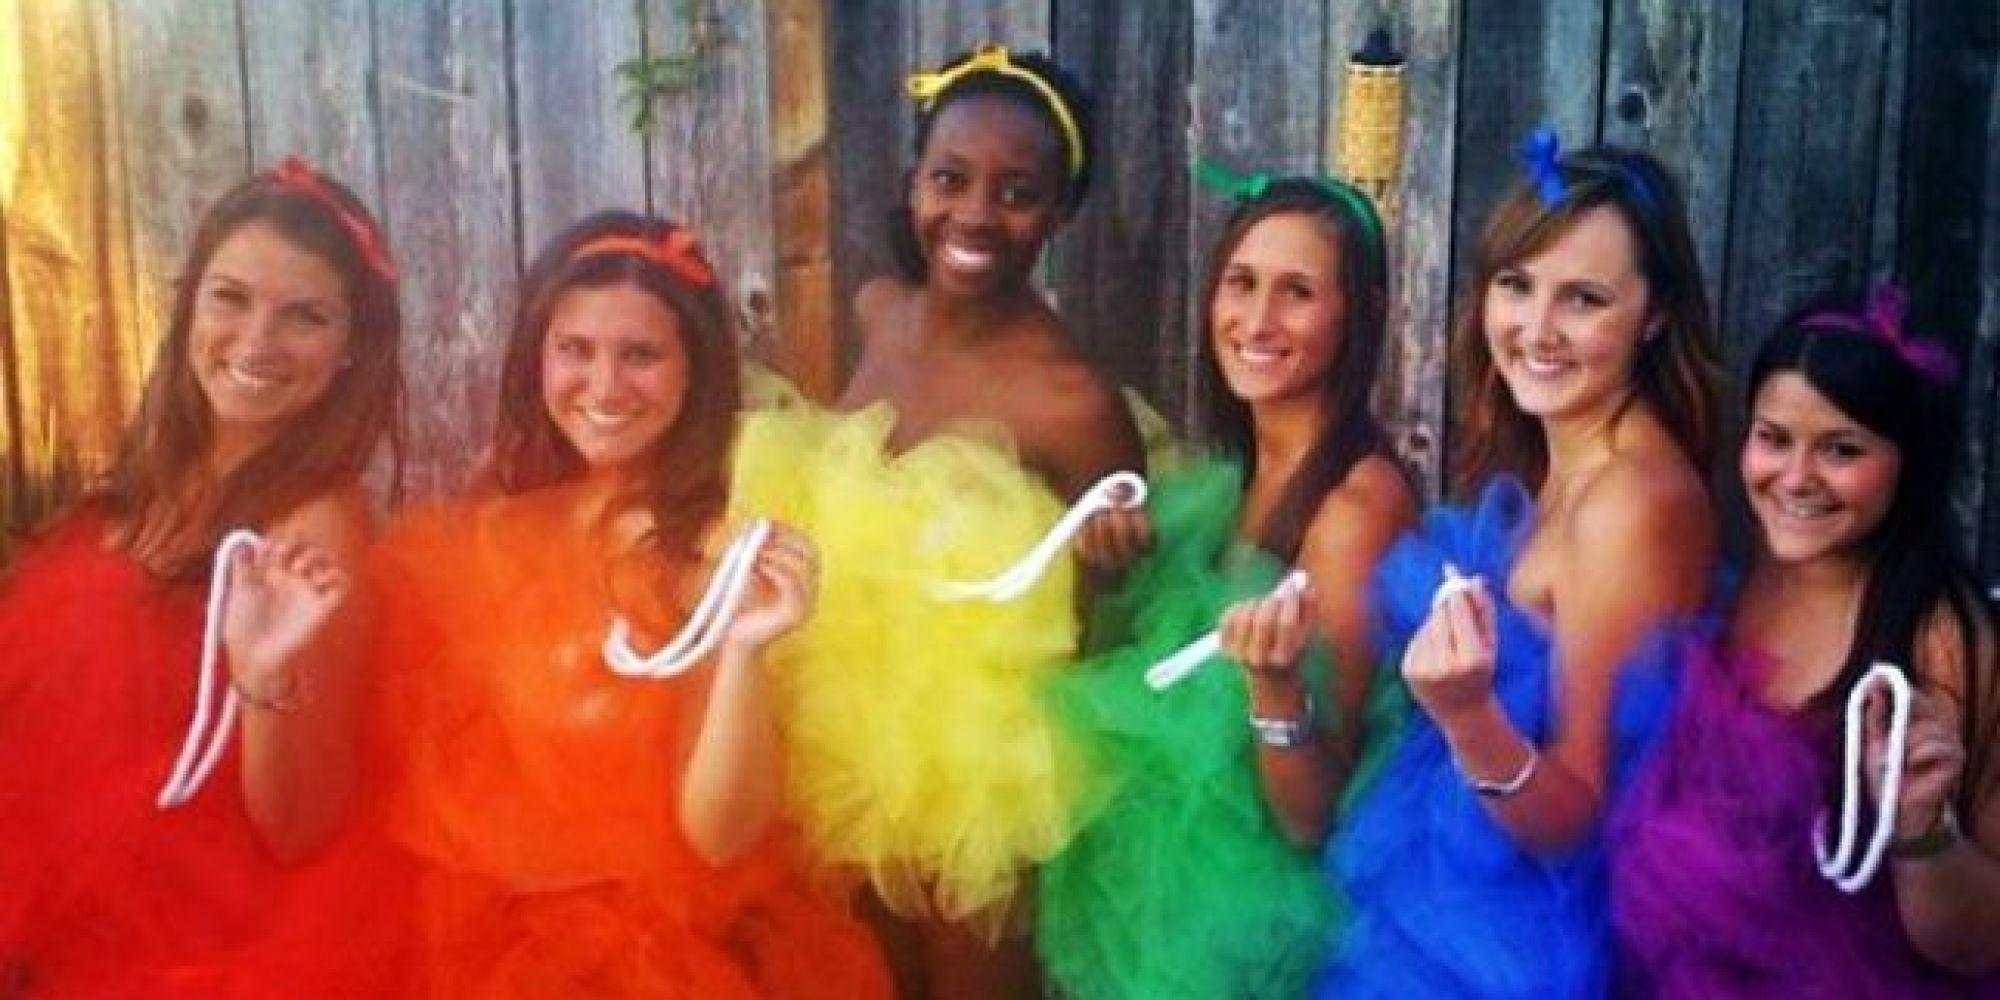 diy halloween costume ideas for groups